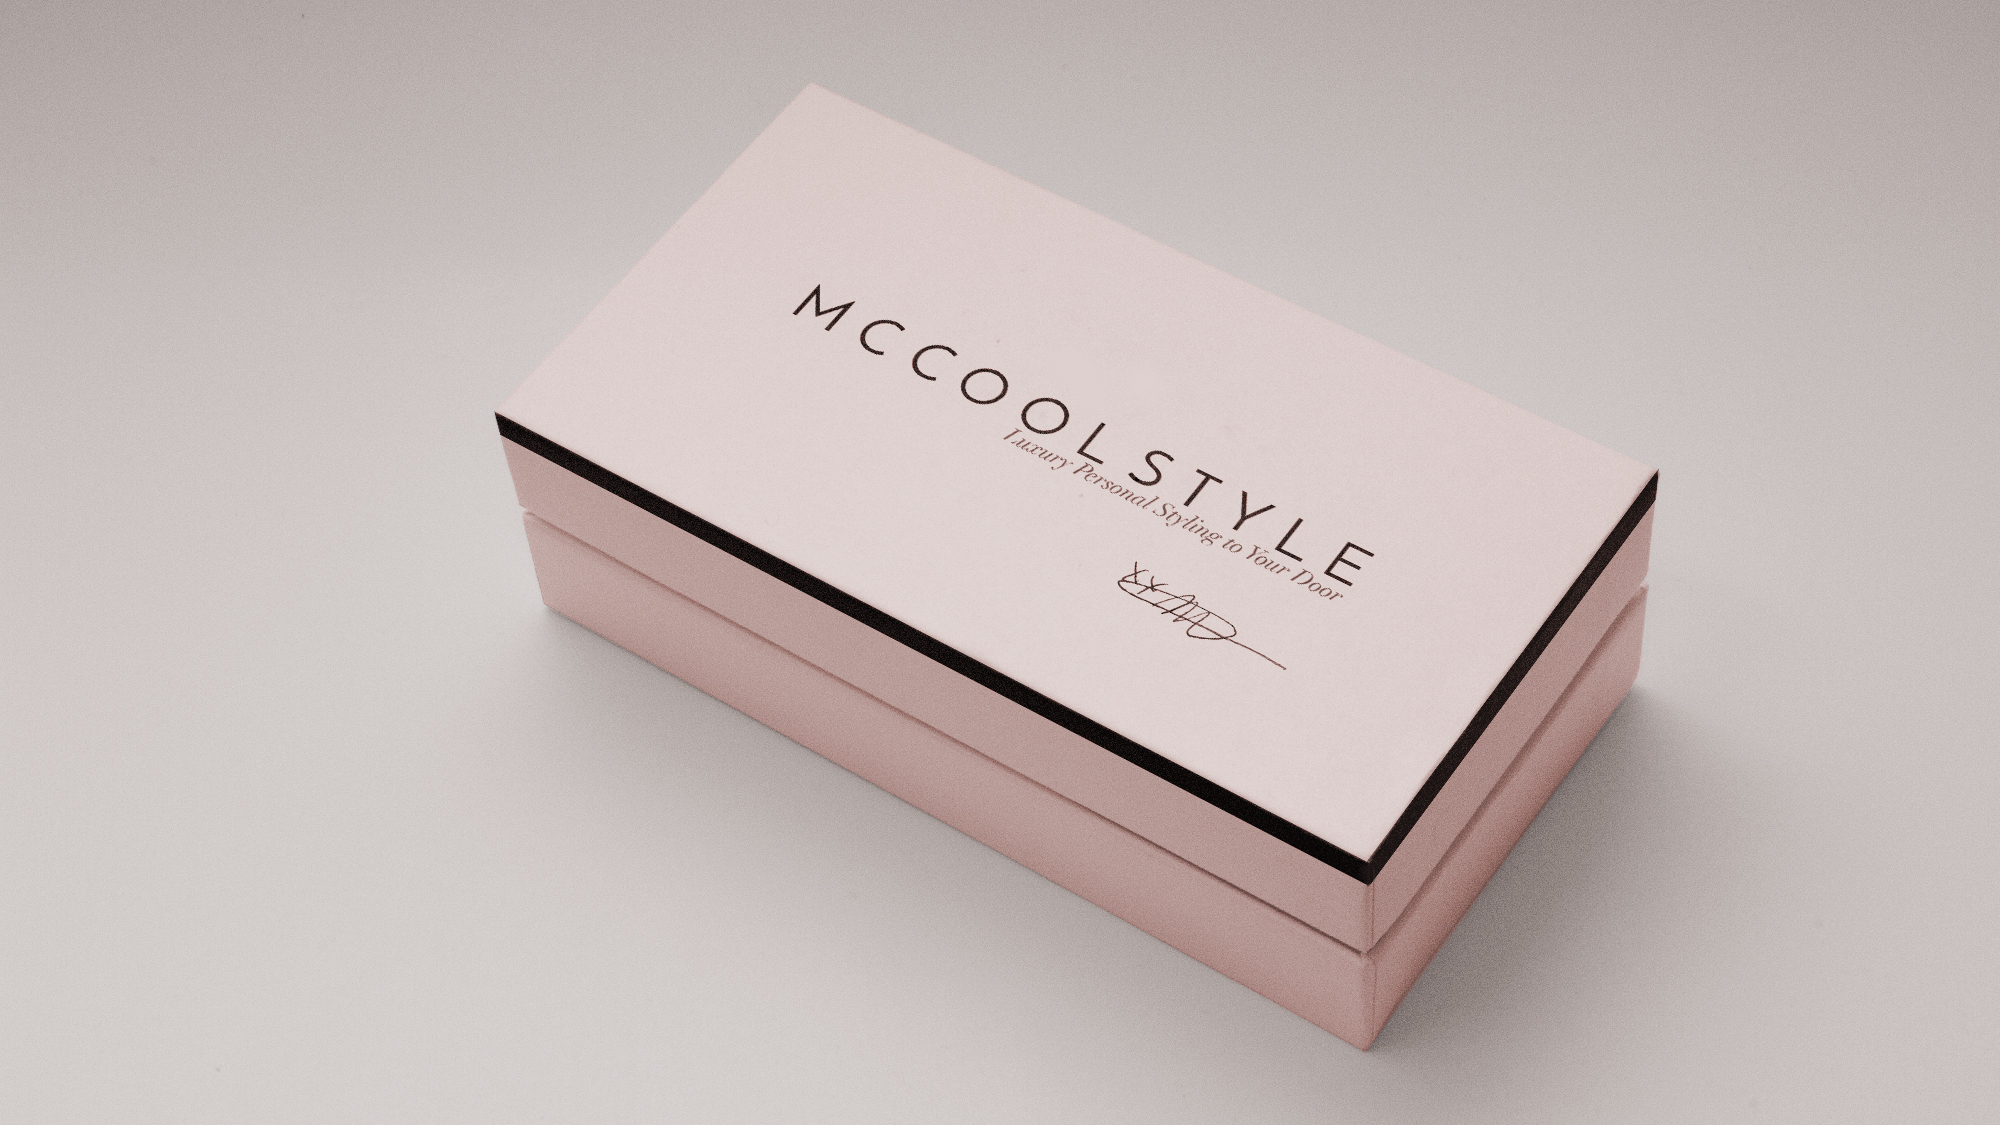 McCoolStyle+Box.jpg